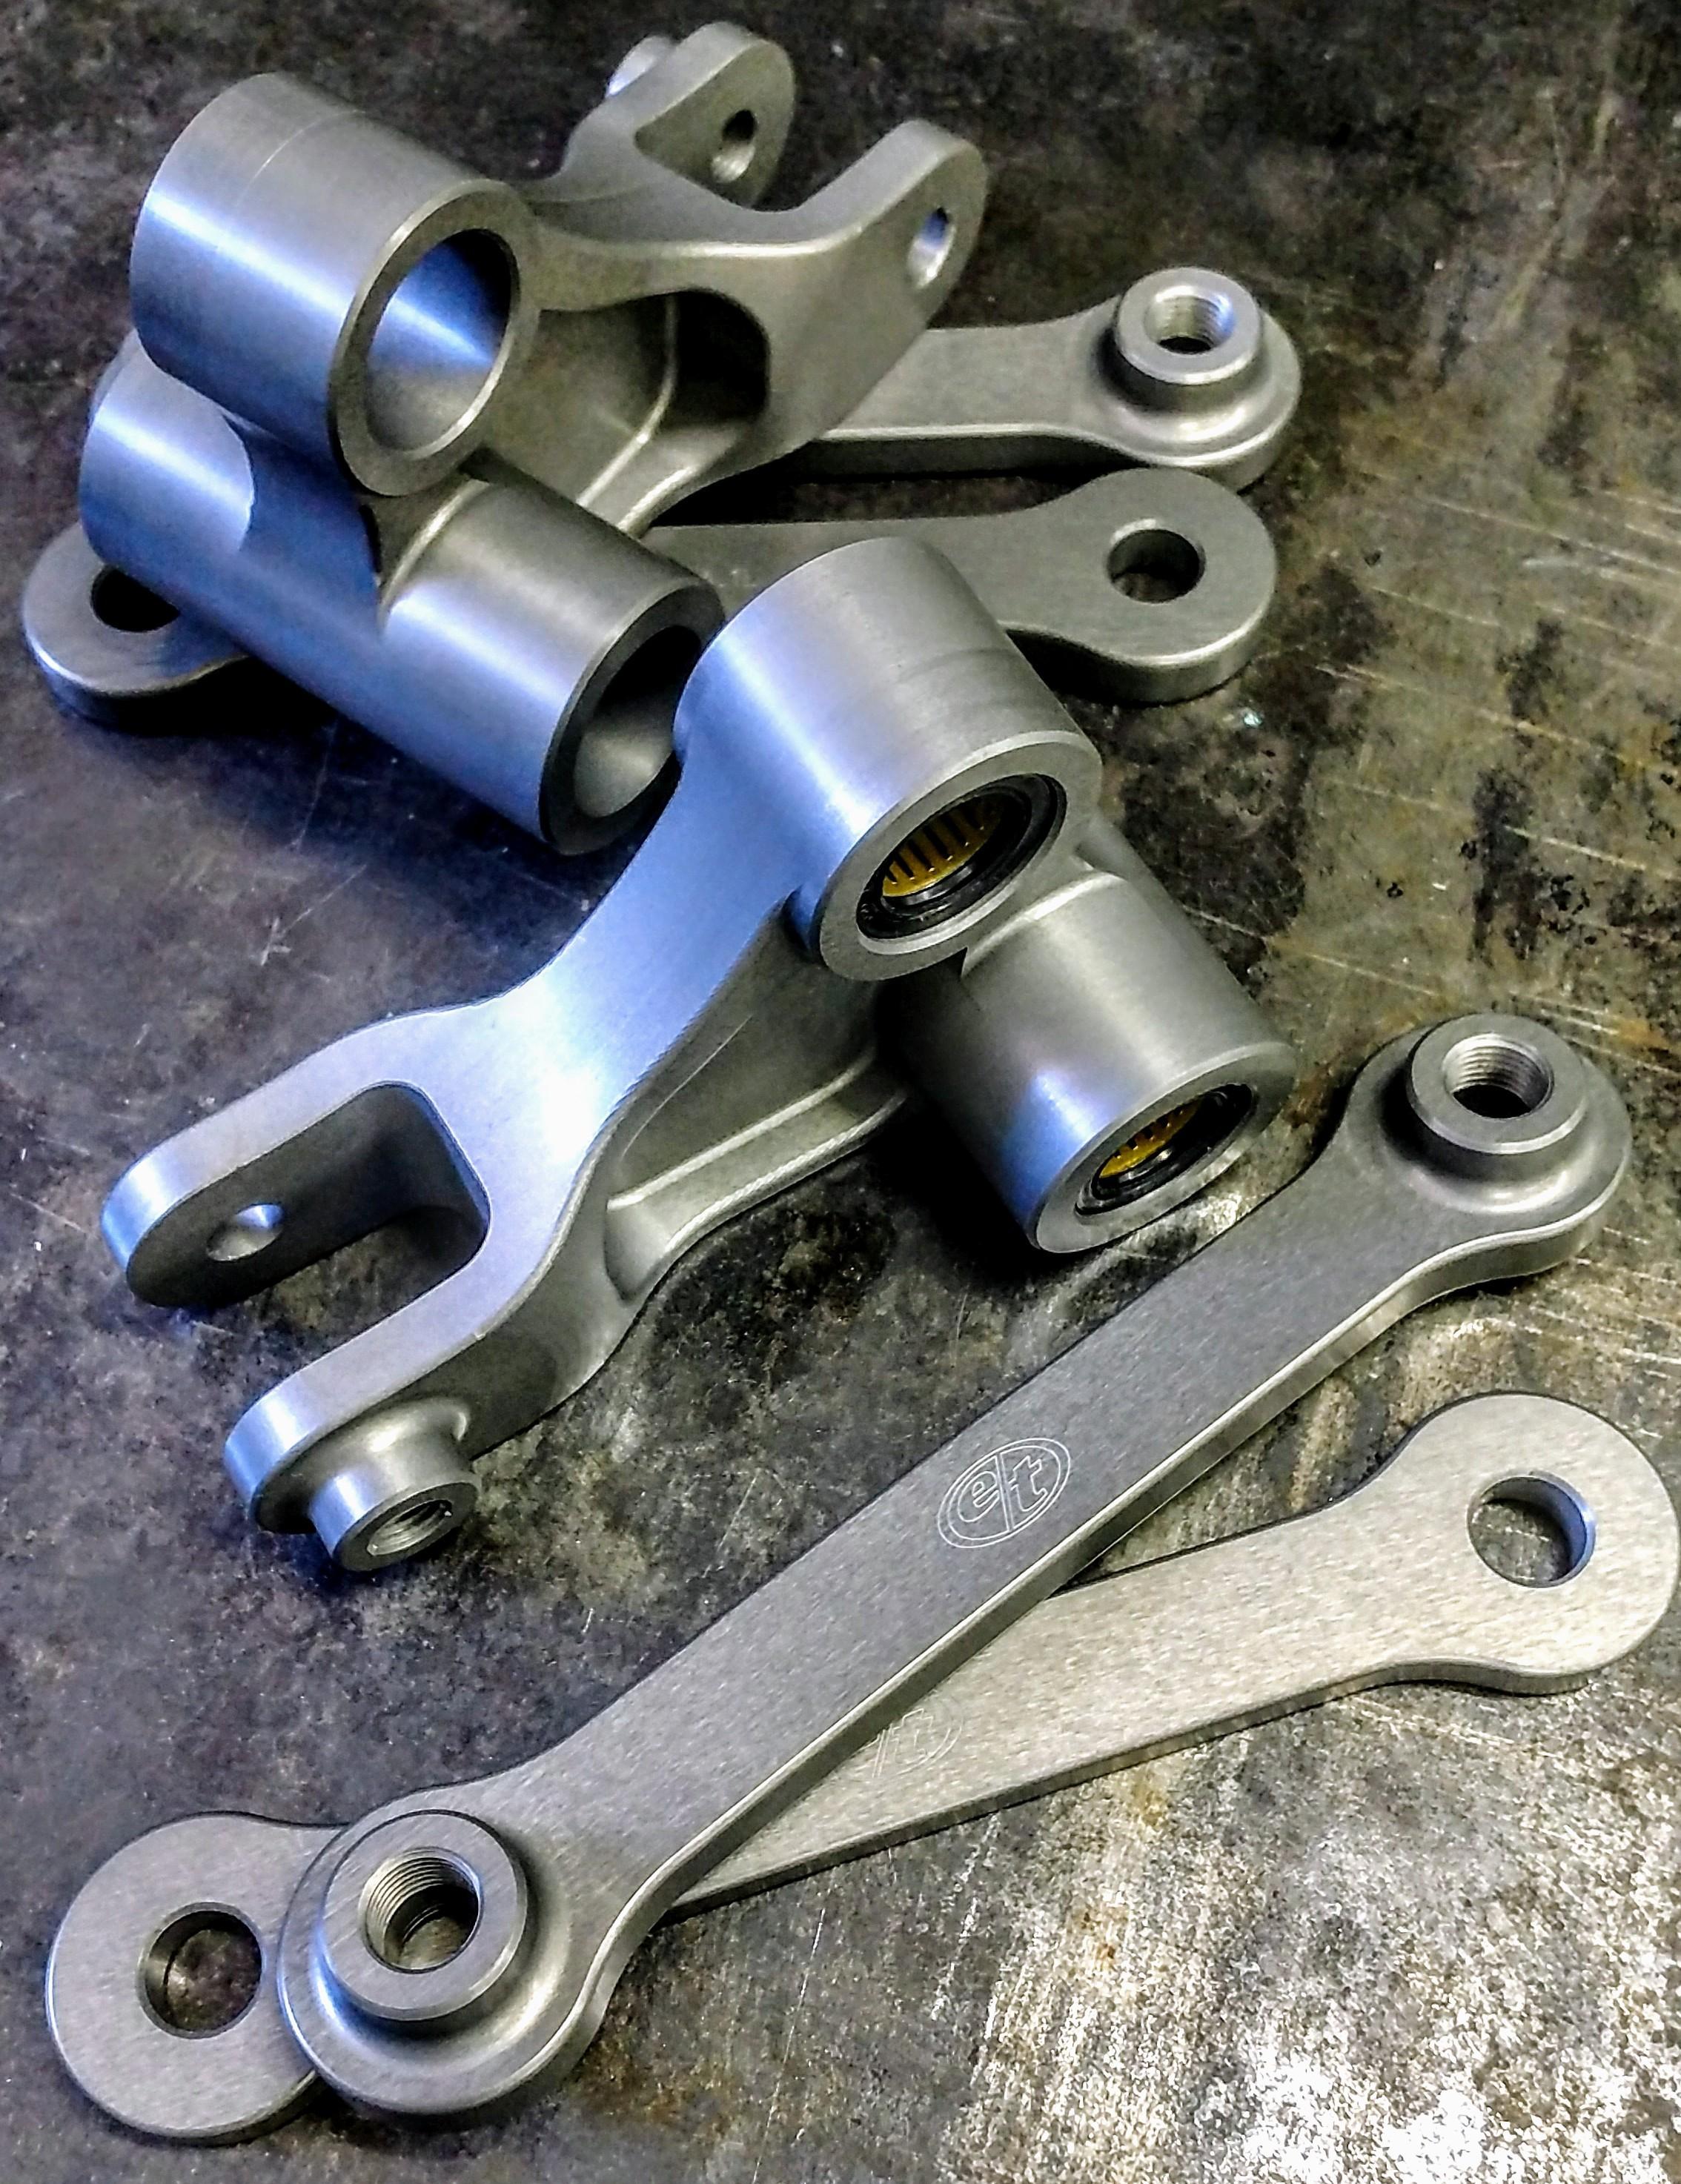 Evol Technology 2015-19 Yamaha YZF-R1 Pirelli Pro Rear Suspension Linkage Kit